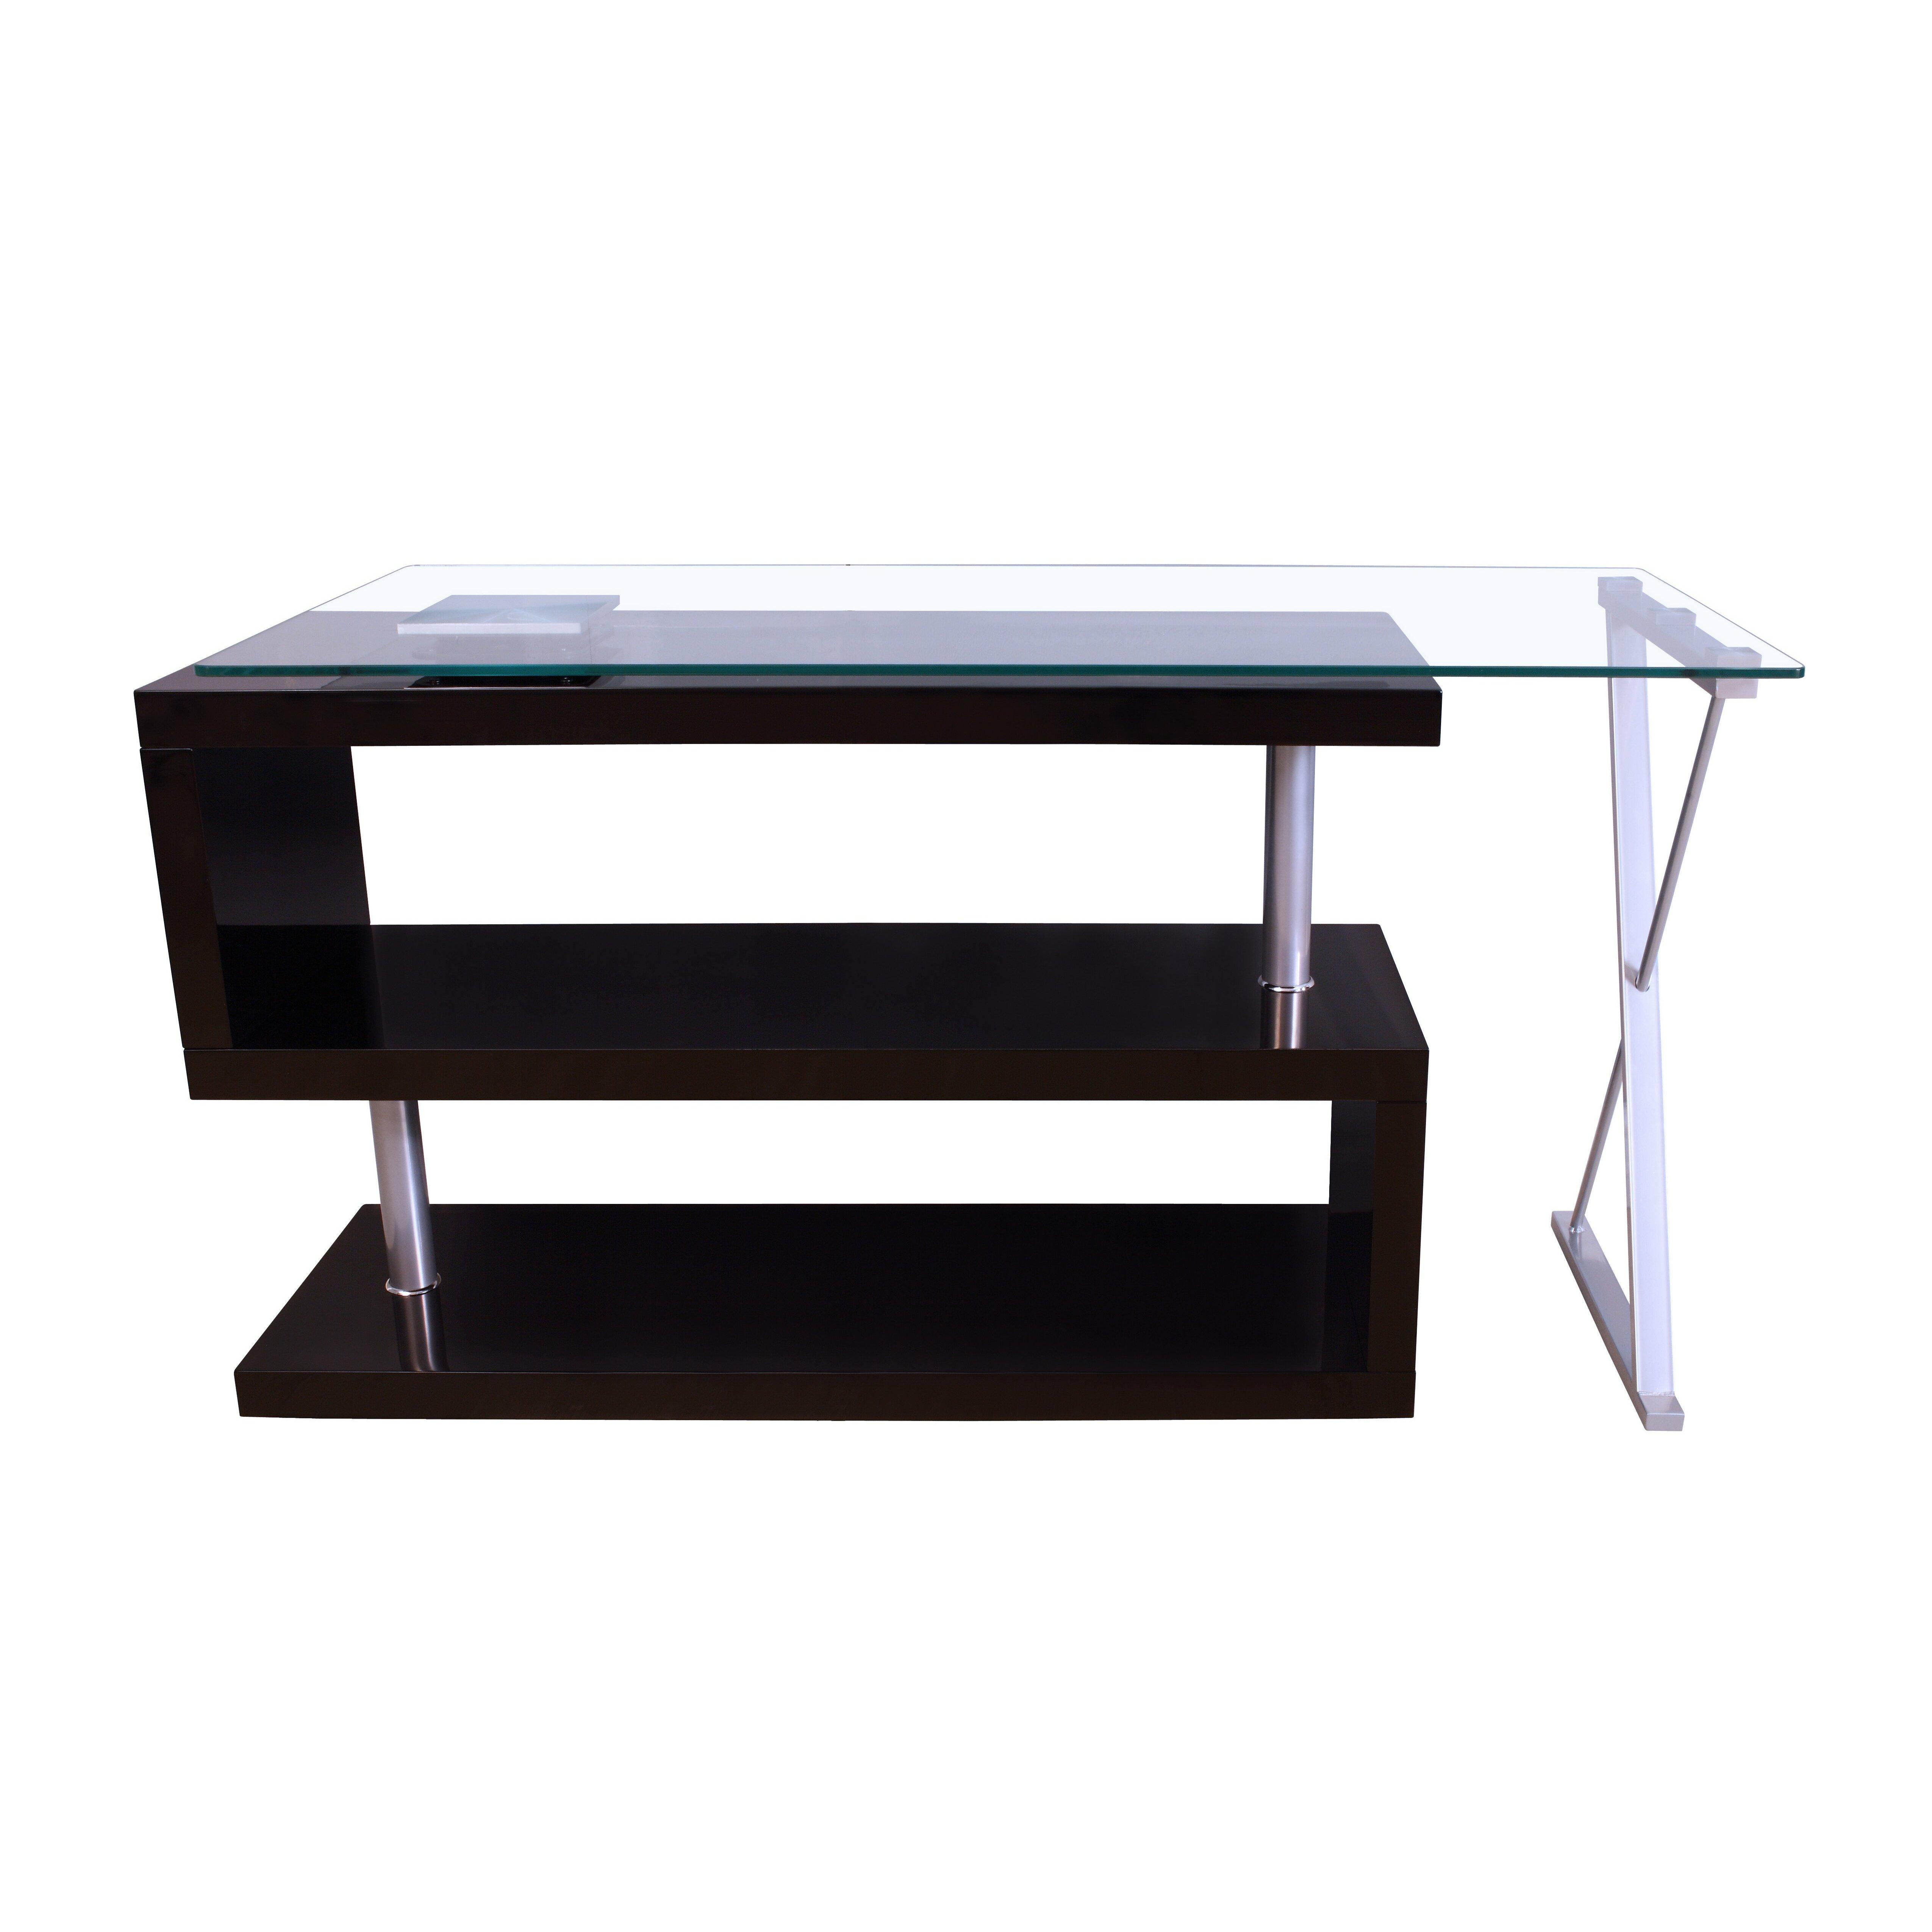 S Shaped Coffee Table Buck High Gloss Convertible S Shape Writing Desk Reviews Allmodern